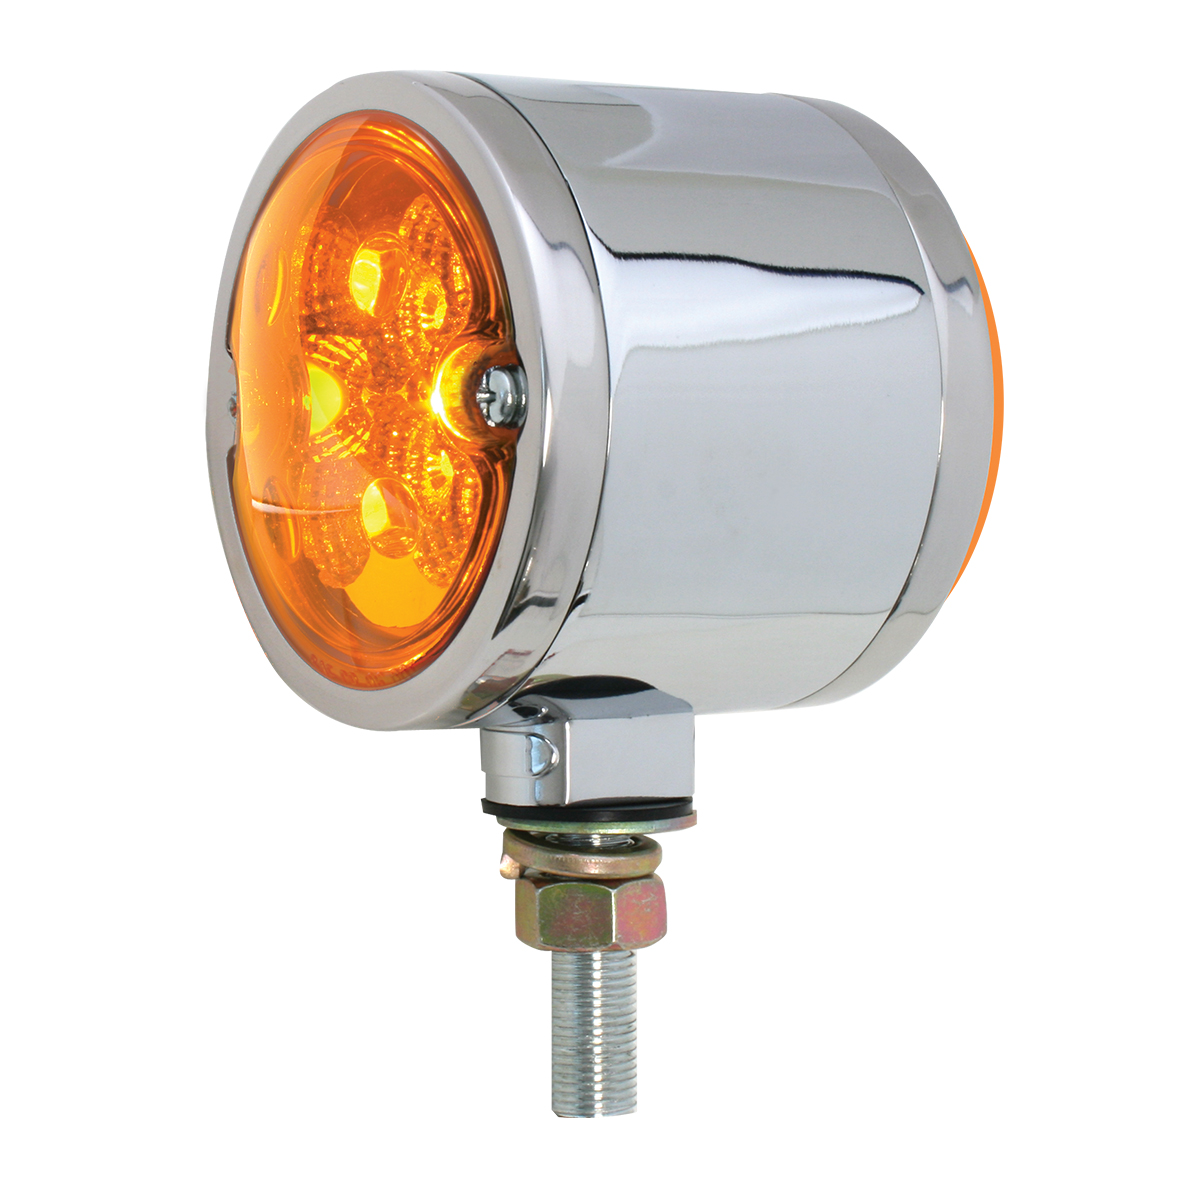 78550 Double Face Spyder LED Light in Amber/Amber